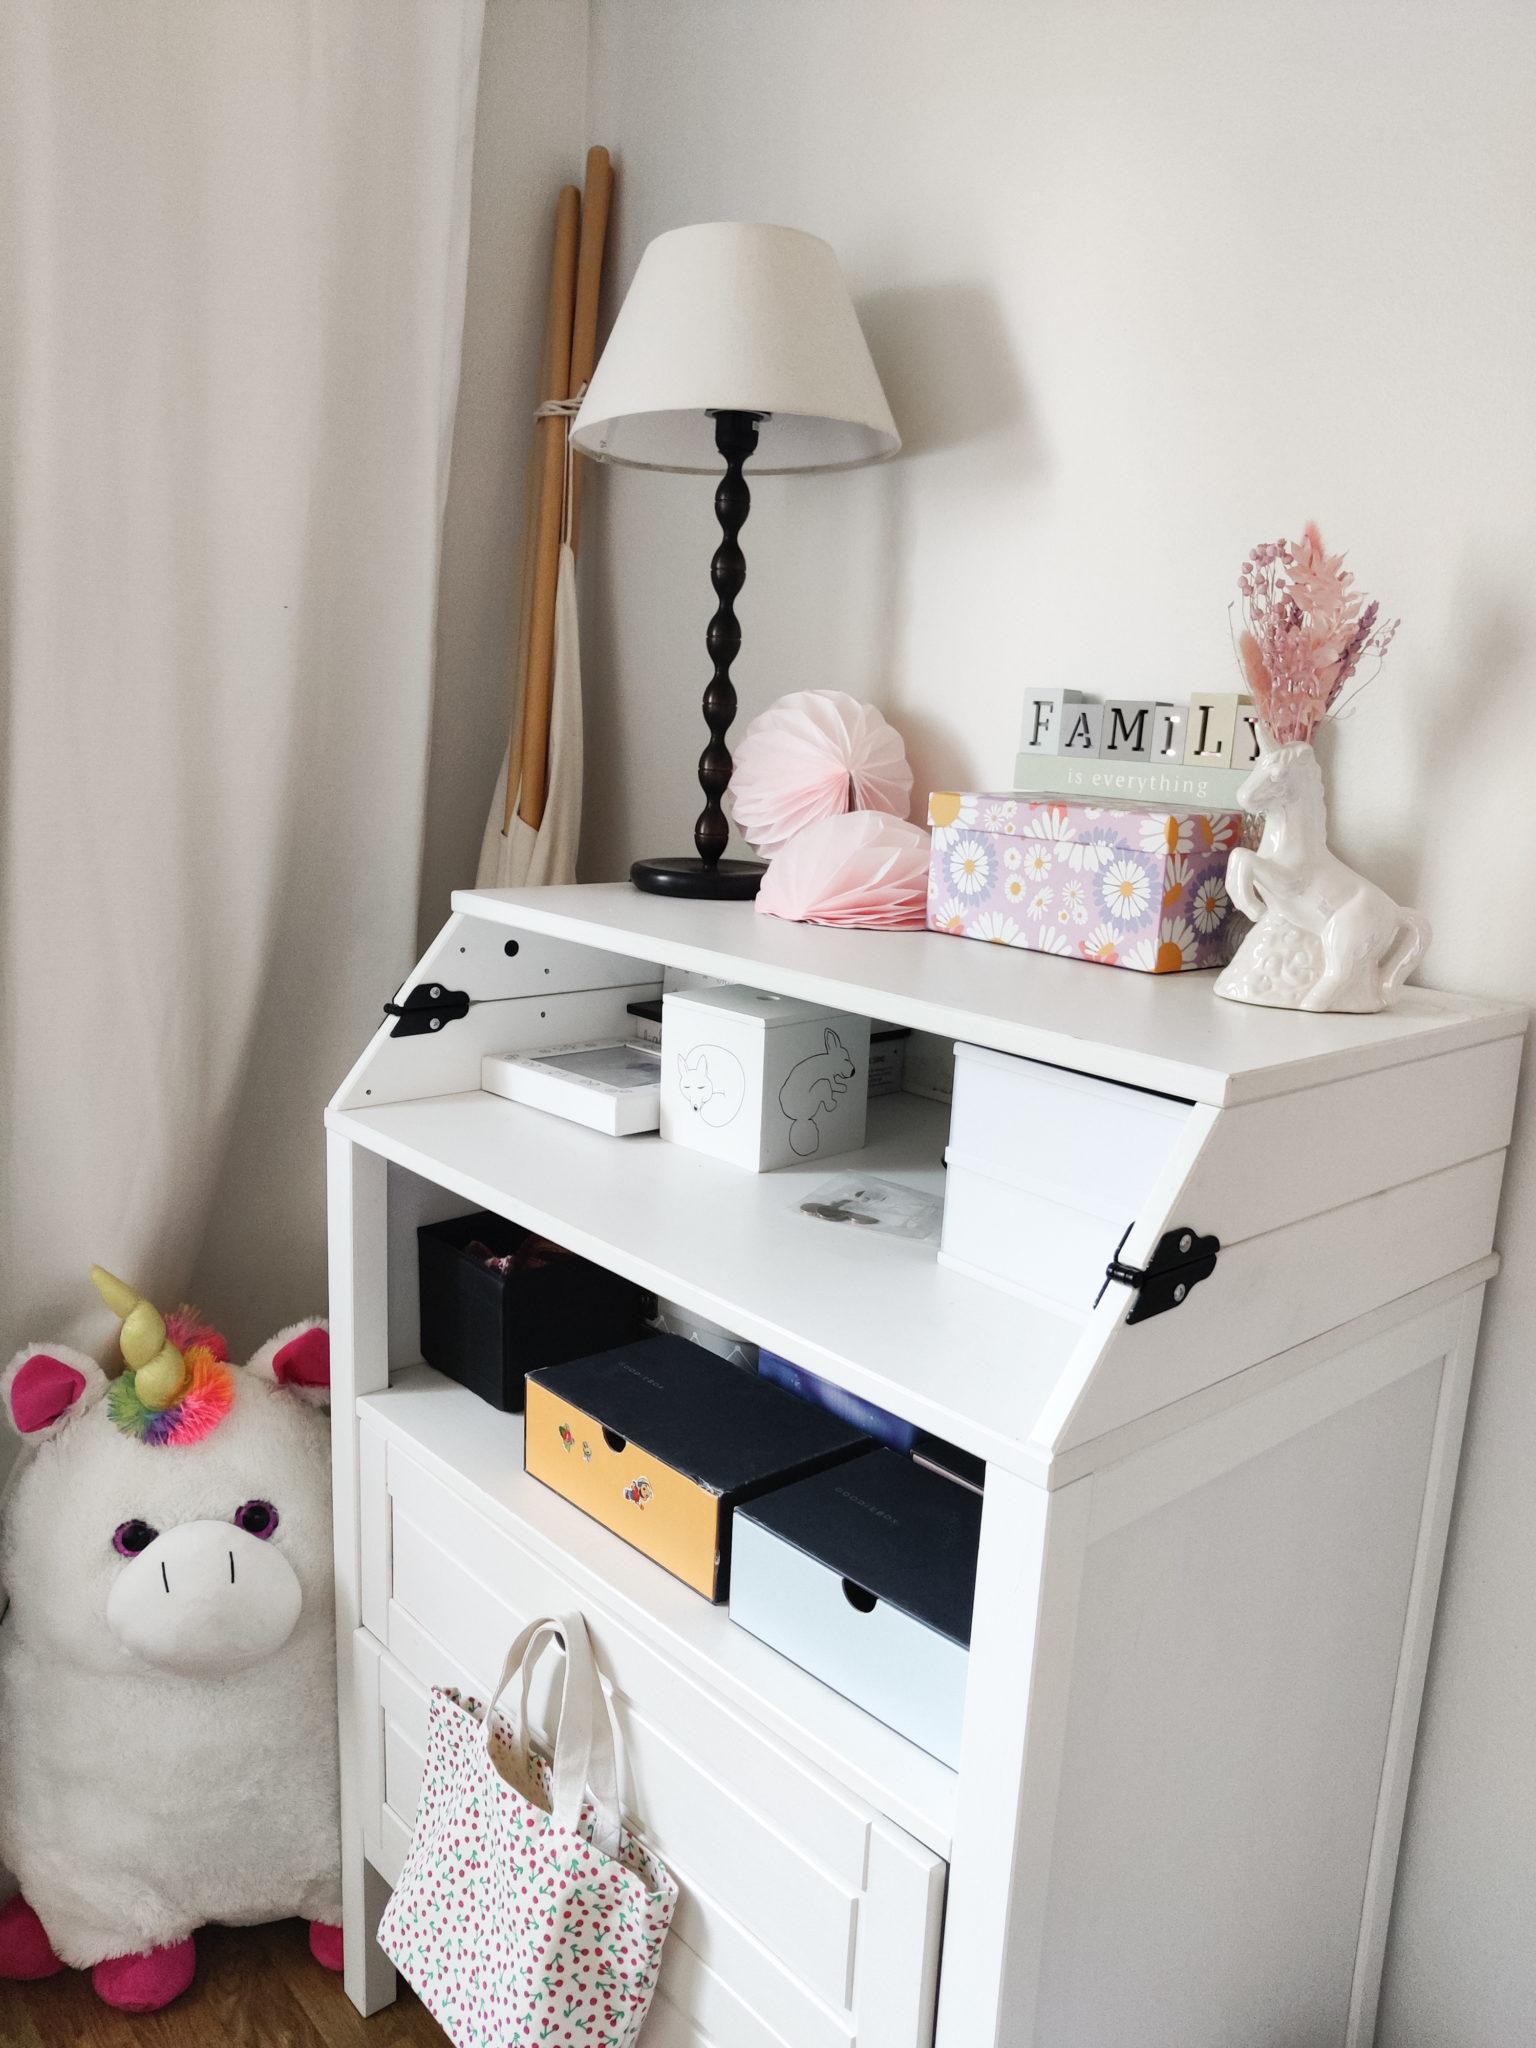 Tyttöjen huone - Sisustusblogi - BMH - Big mamas home by Jenni